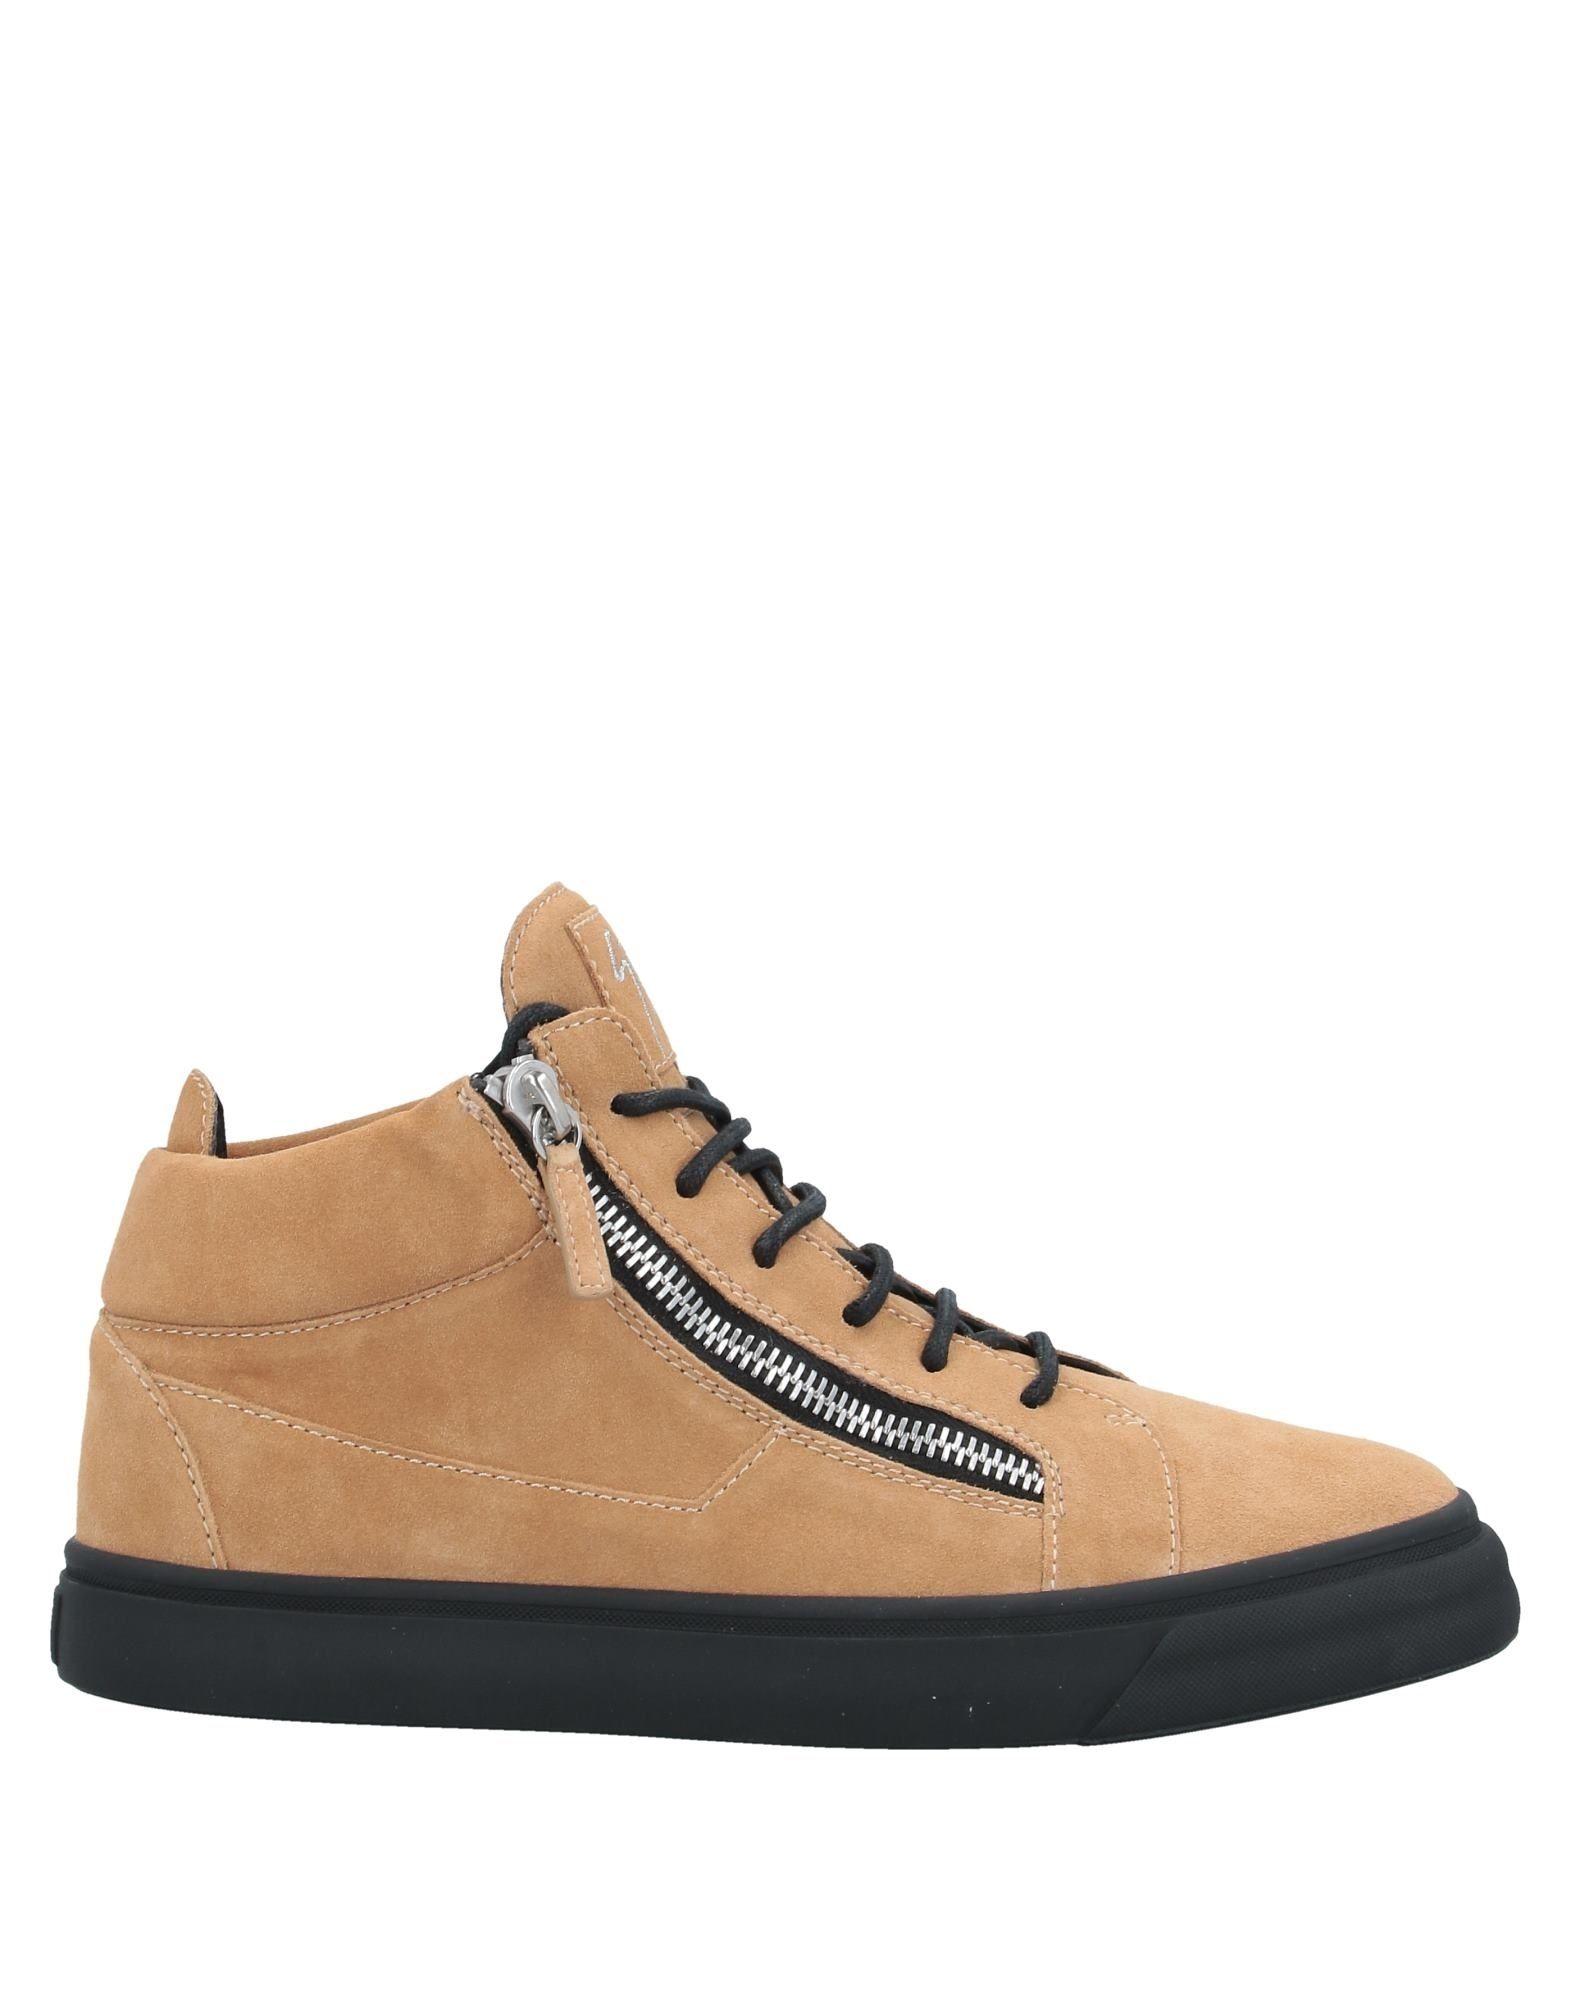 GIUSEPPE ZANOTTI Высокие кеды и кроссовки giuseppe zanotti высокие кеды и кроссовки